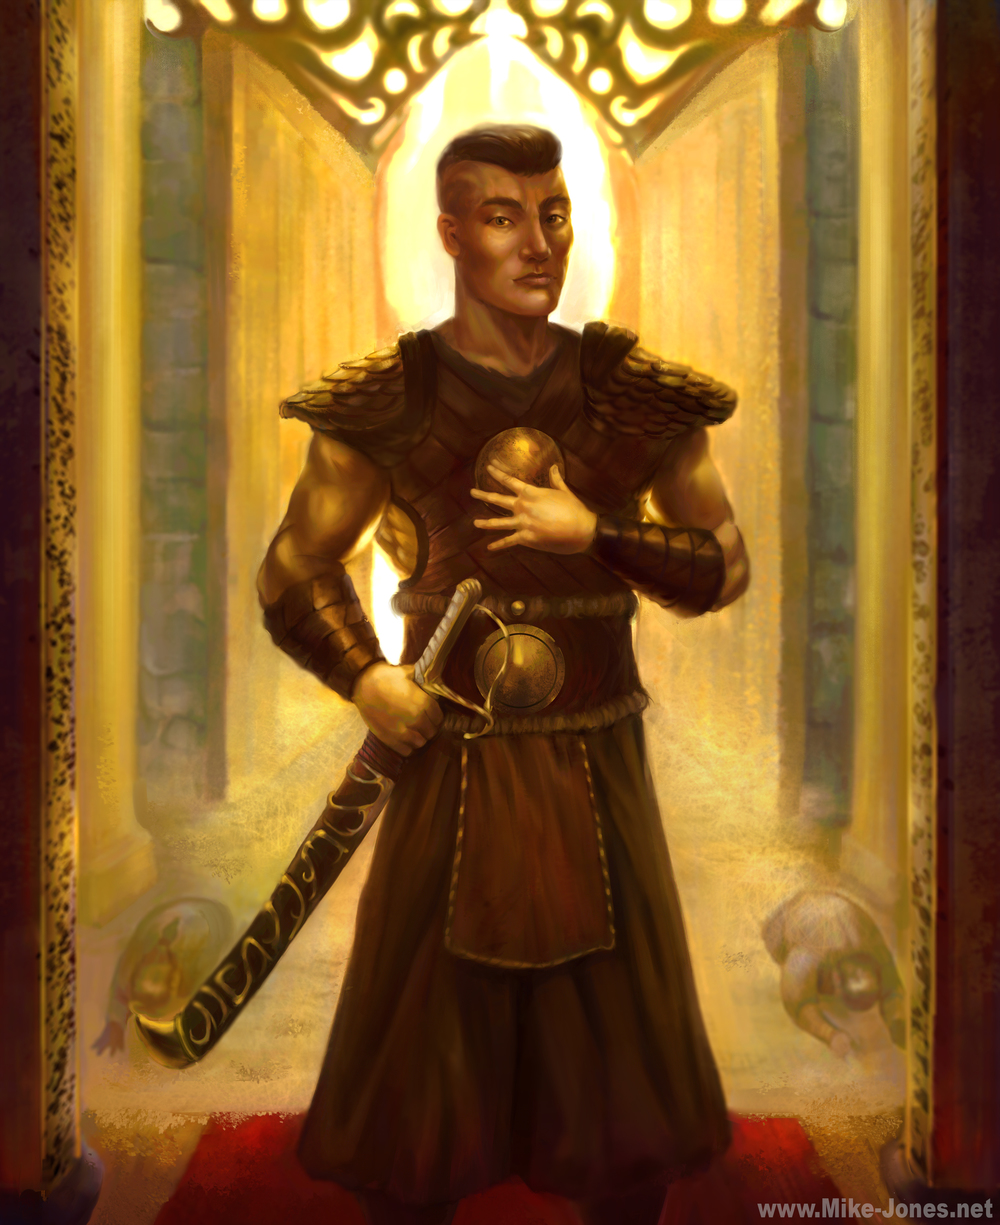 mike jones-mongol knight.jpg